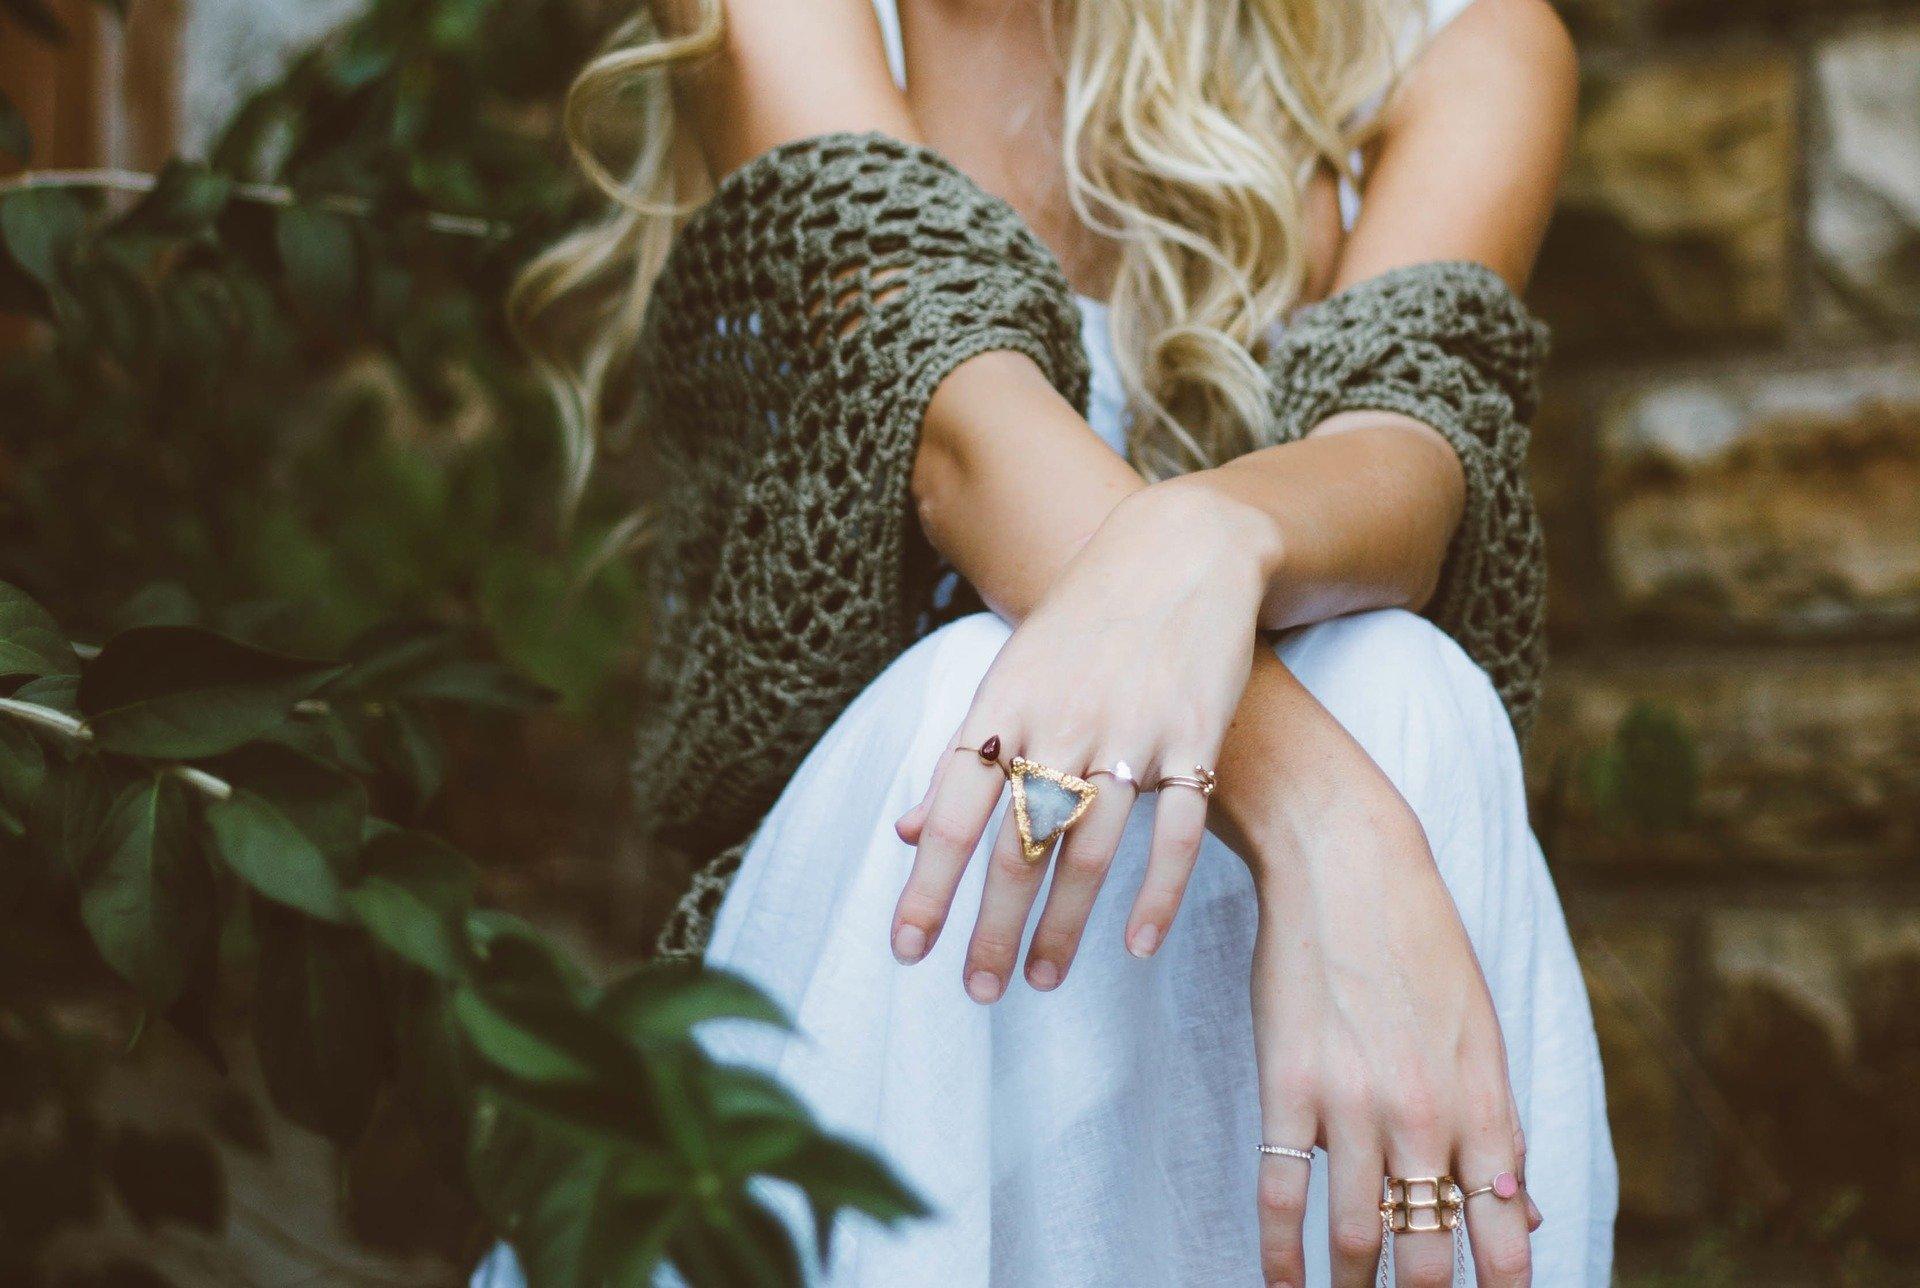 ruce šperky